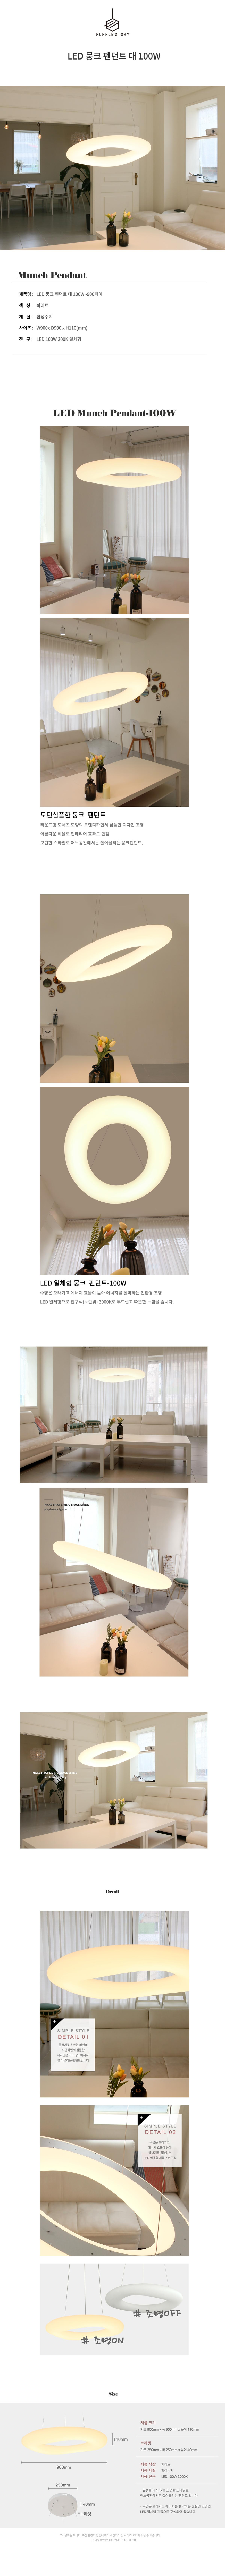 LED 뭉크 펜던트 대 100W(LED램프포함) - 퍼플스토리, 528,000원, 디자인조명, 팬던트조명